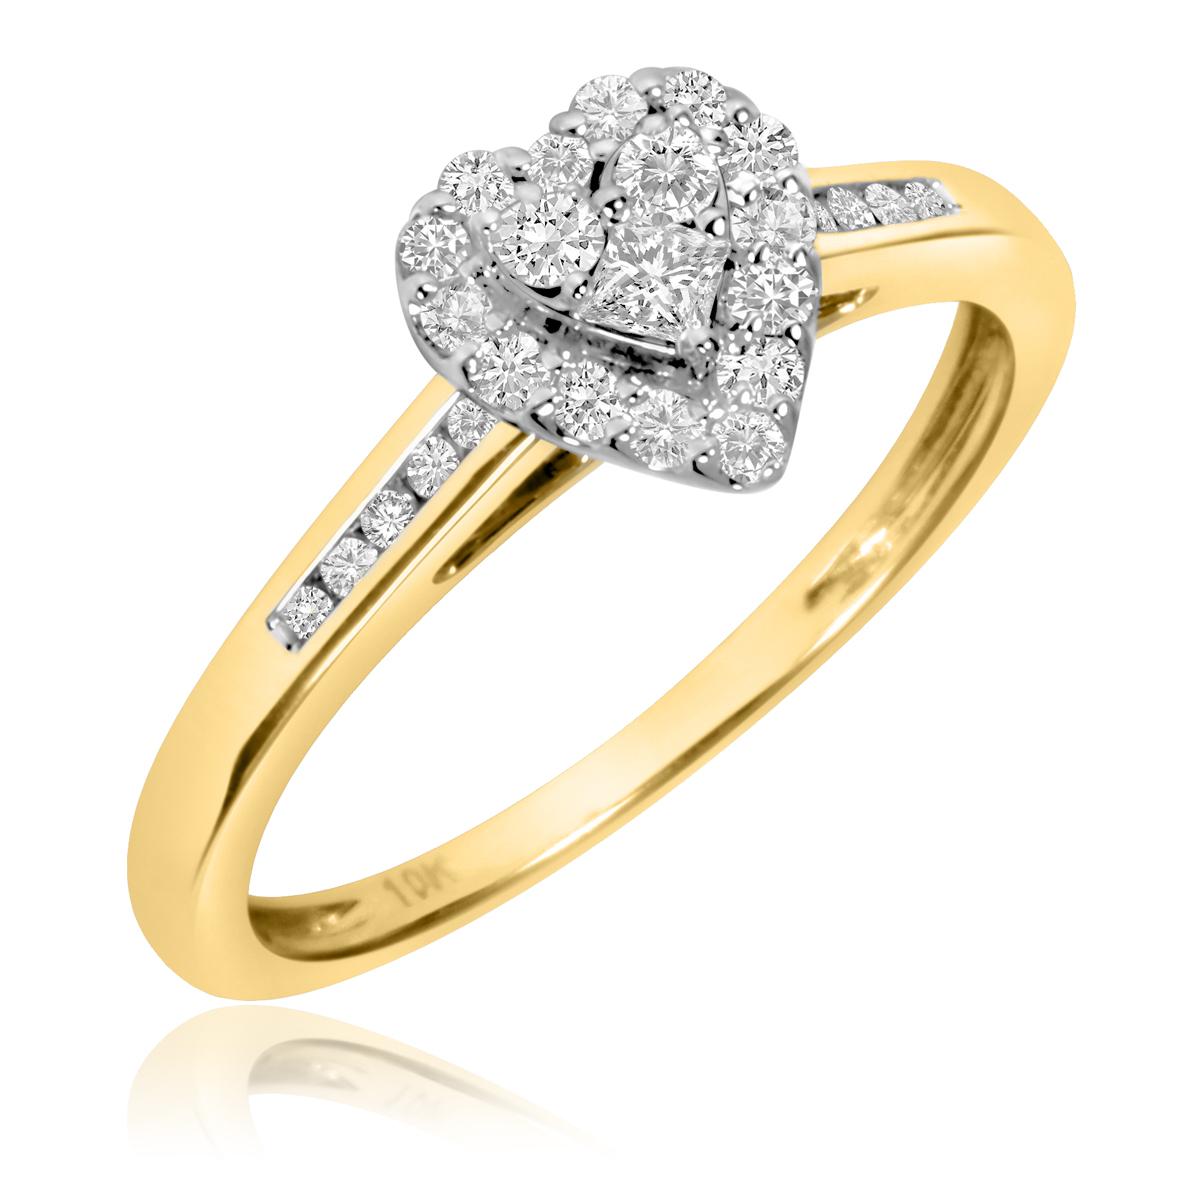 1/3 Carat T.W. Round Cut Diamond Ladies Engagement Ring 14K Yellow Gold- Size 8